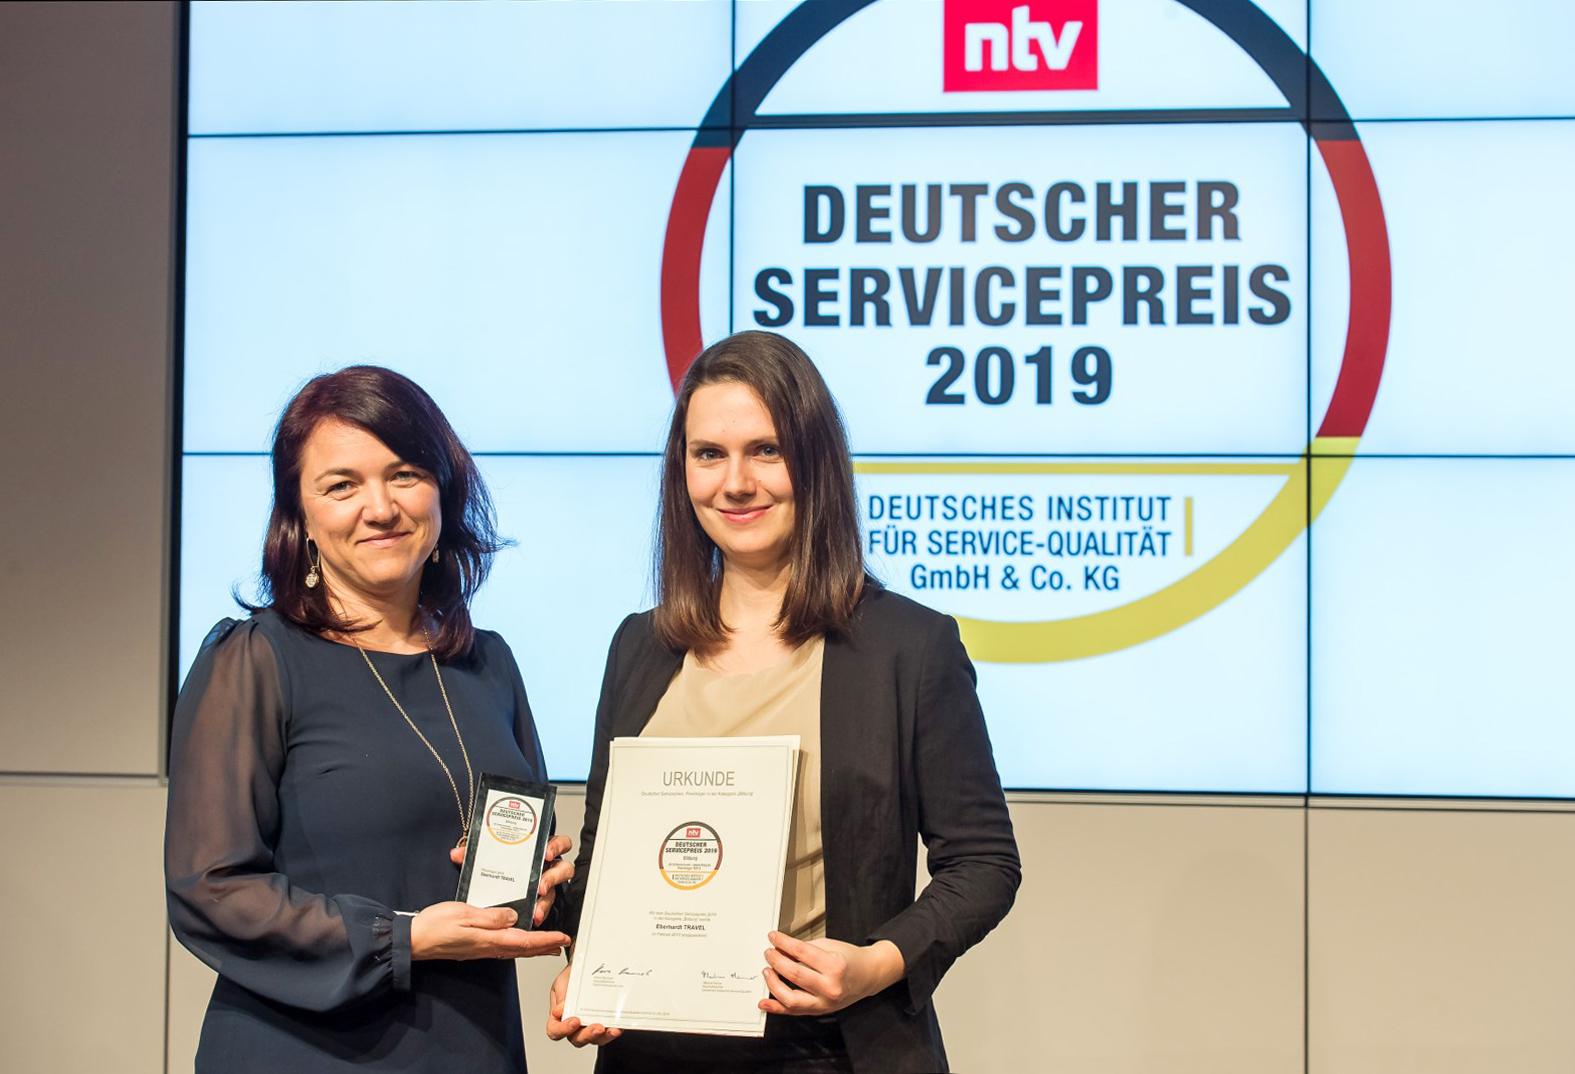 https://assets.eberhardt-travel.de/2019/Newsletter/67509_Deutscher_Servicepreis_2019_Original.jpg